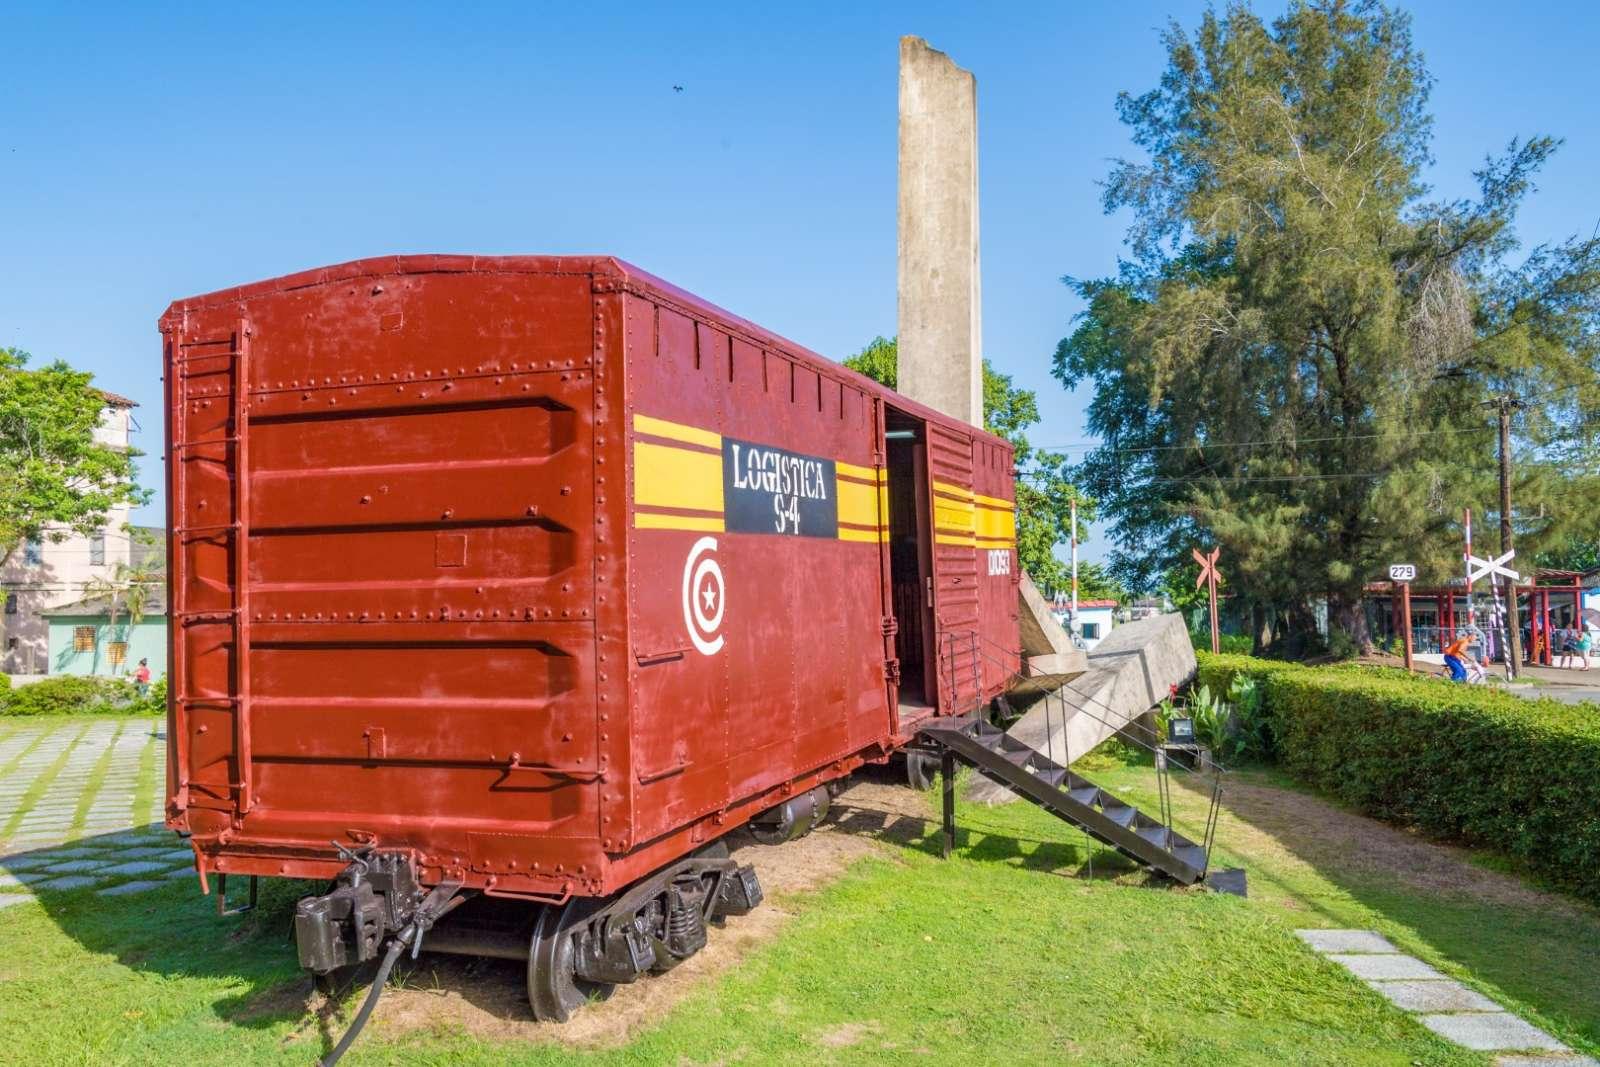 Museum Tren Blindado in Santa Clara, Cuba